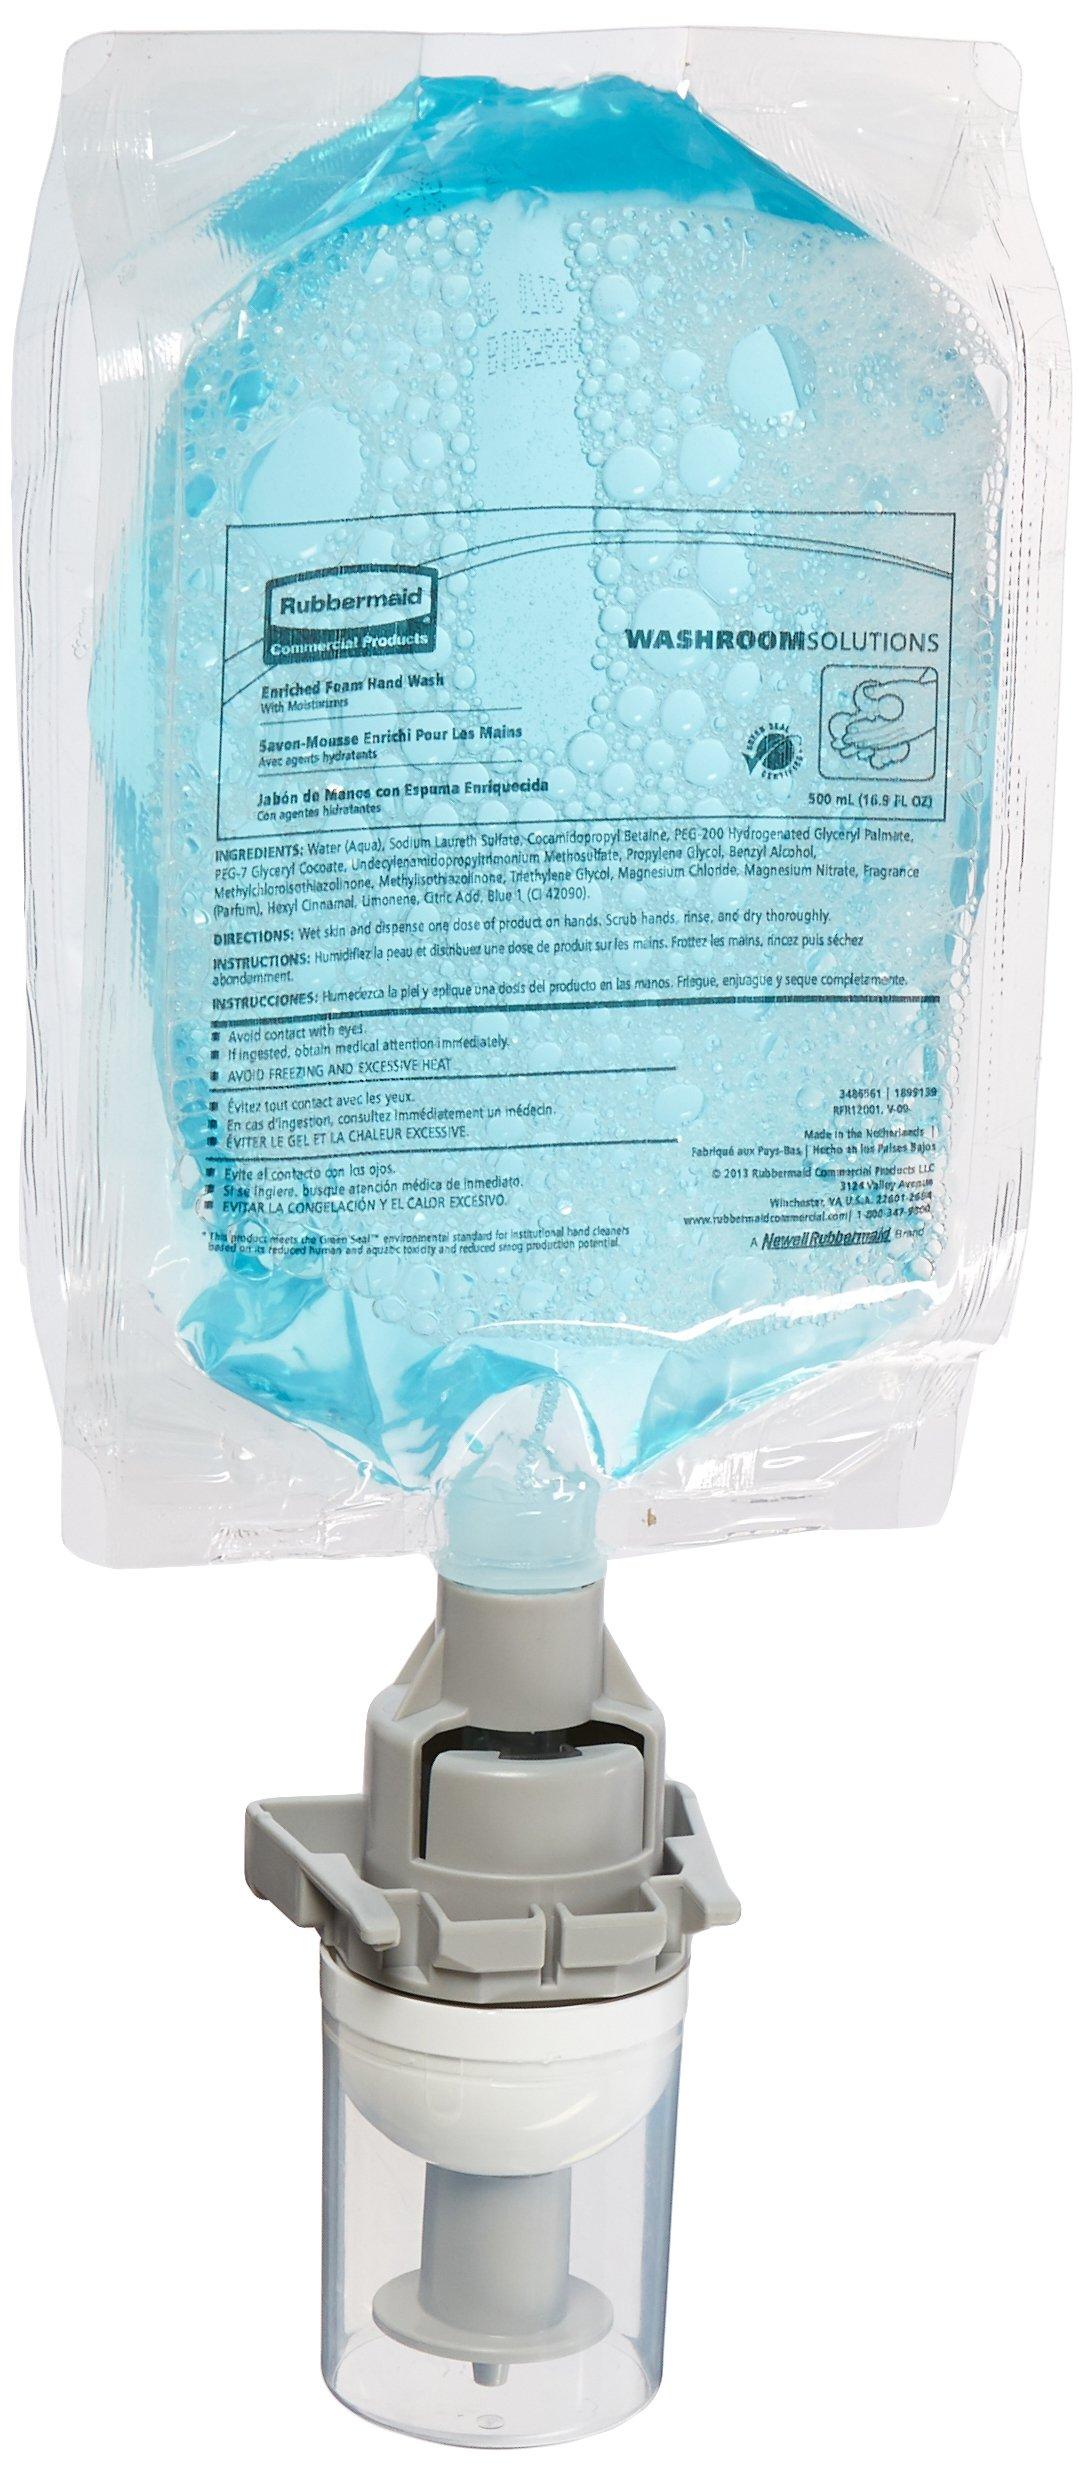 Rubbermaid Commercial Enriched Hand Soap Refill for Flex Skin Care Soap Dispenser, Rich Aqua Foam, 500-mL